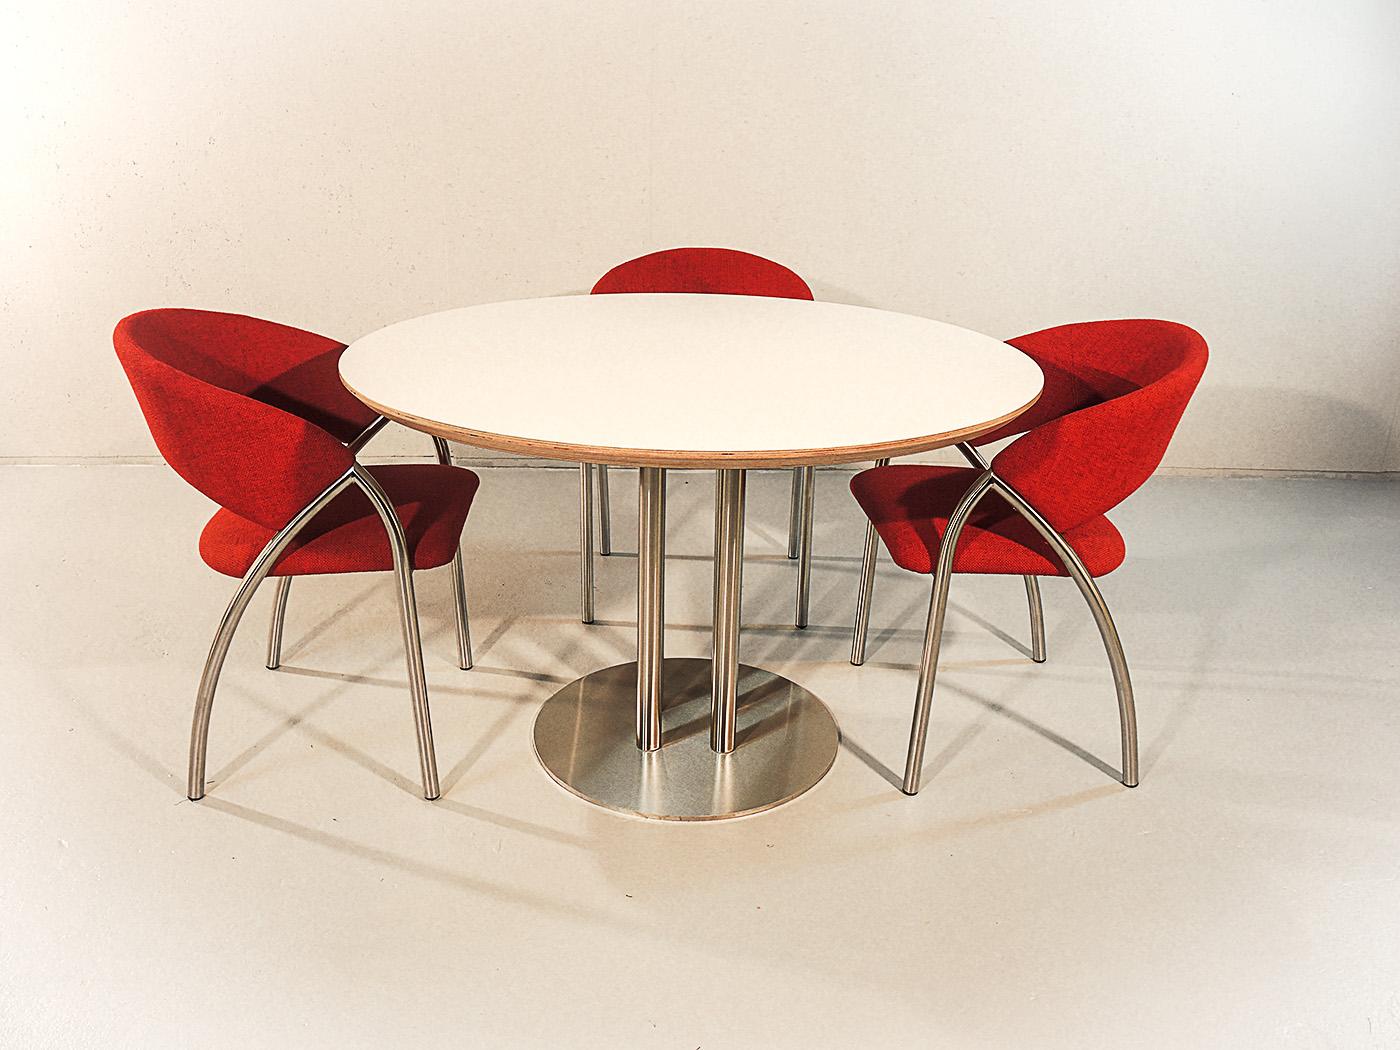 Arrezo - Ronde design tafel